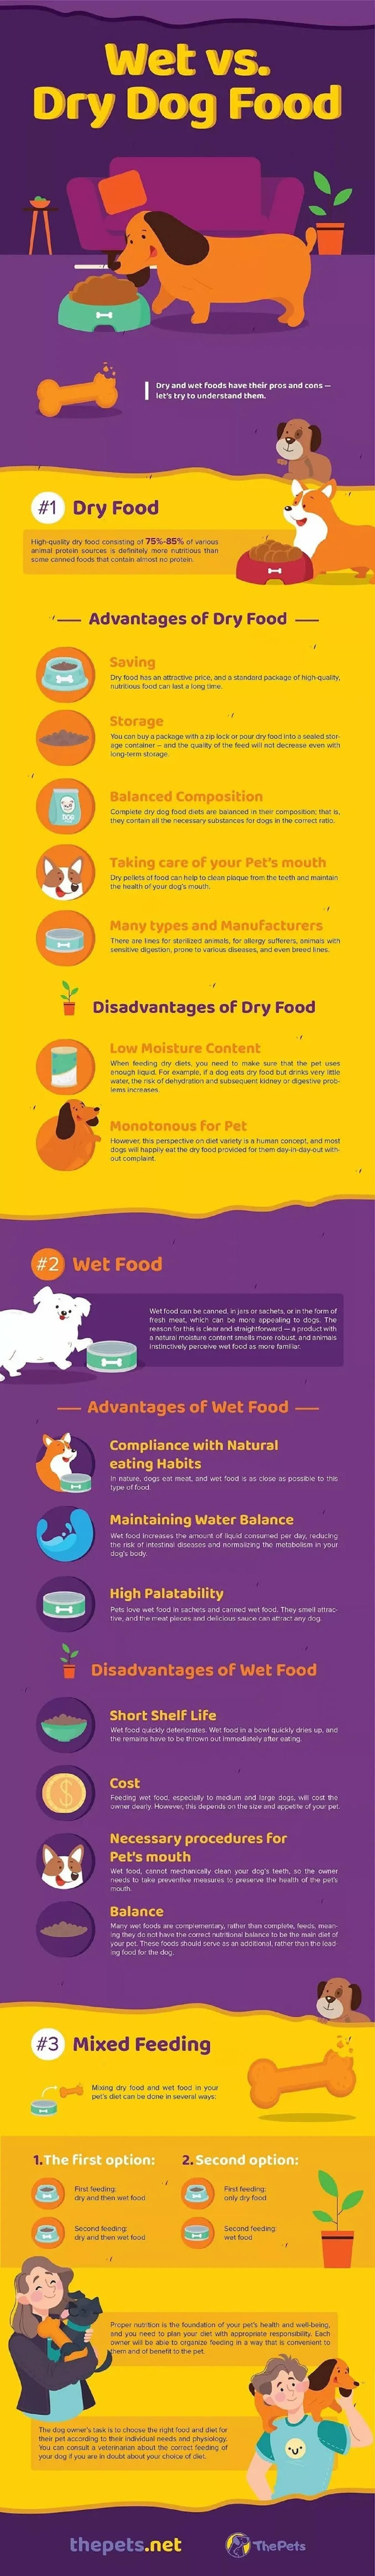 wet-vs-dry-dog-food-infographic